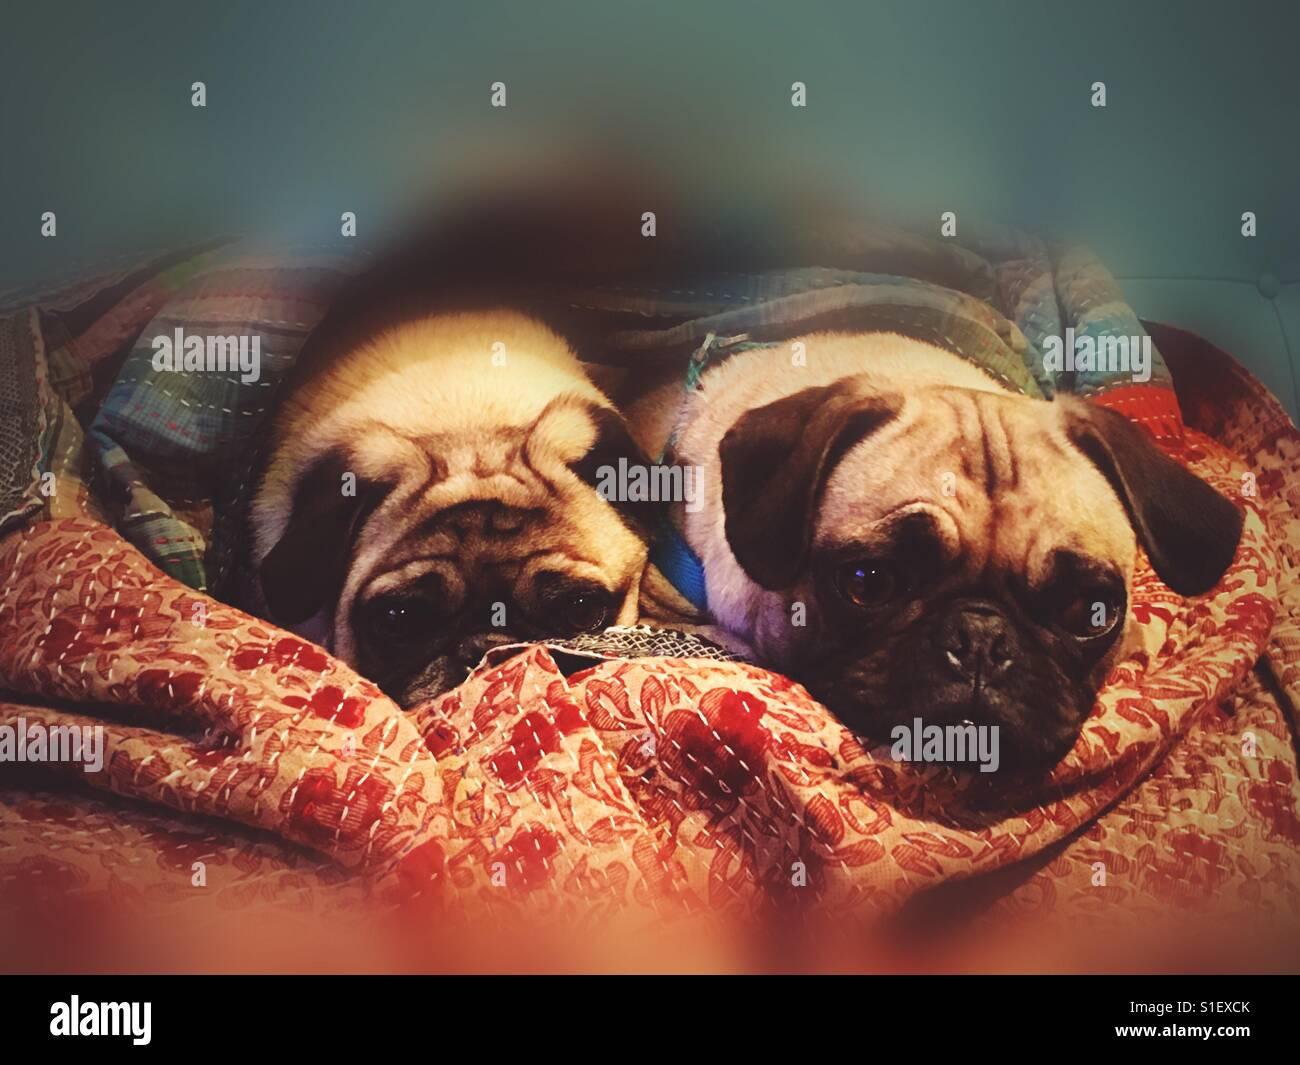 Dos Pugs - Stock Image